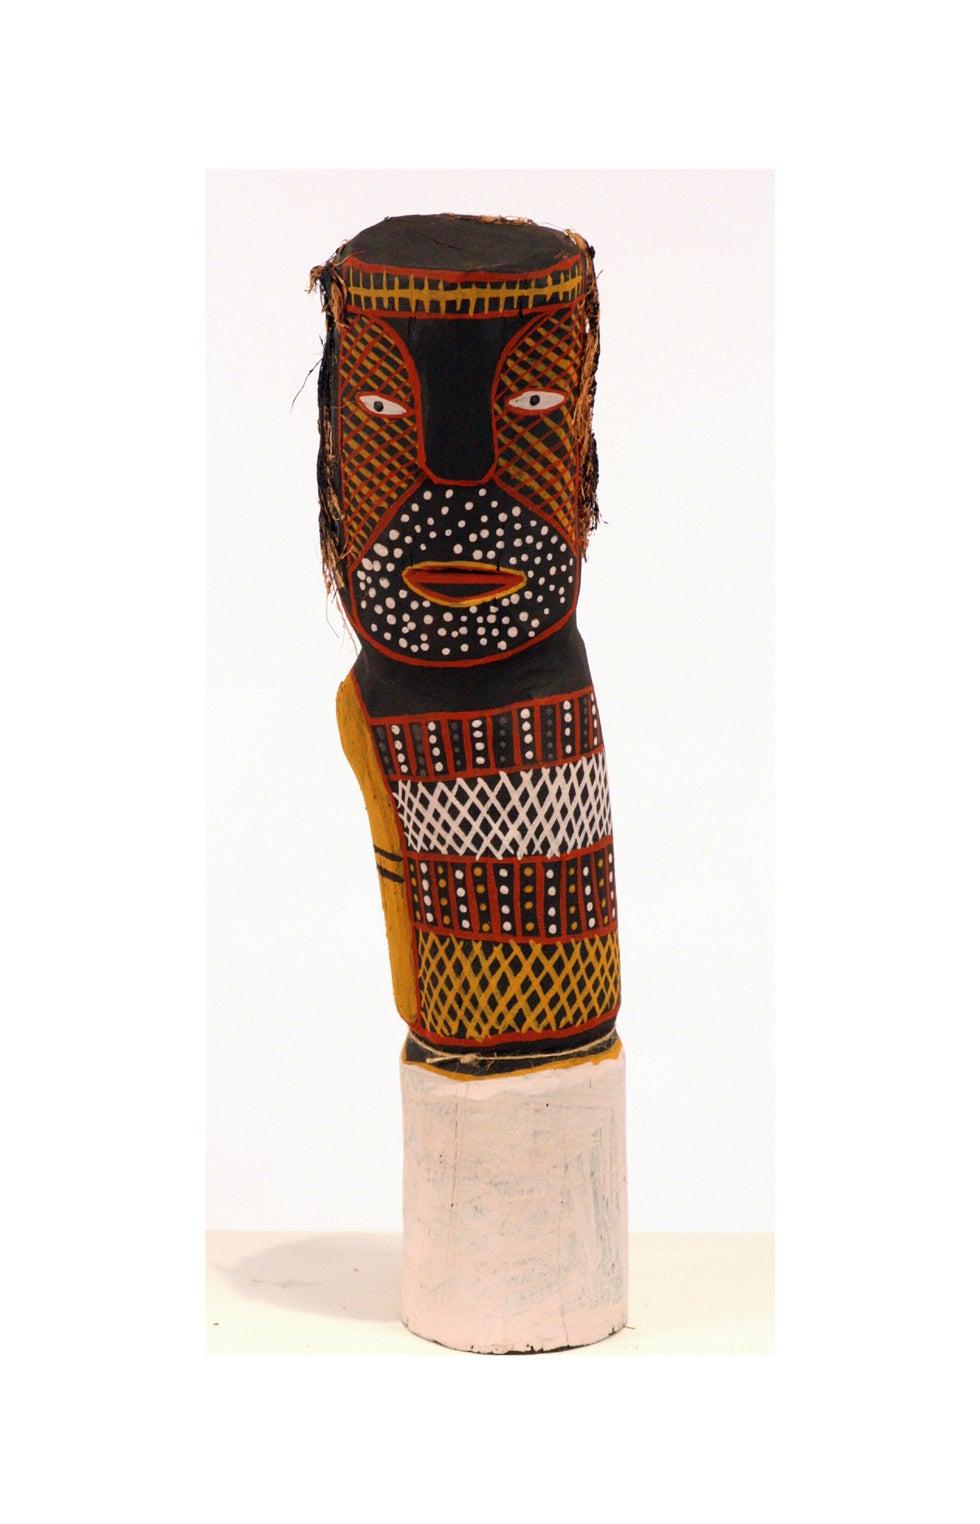 Australian aboriginal ironwood Bima Figure Carving Tiwi Island